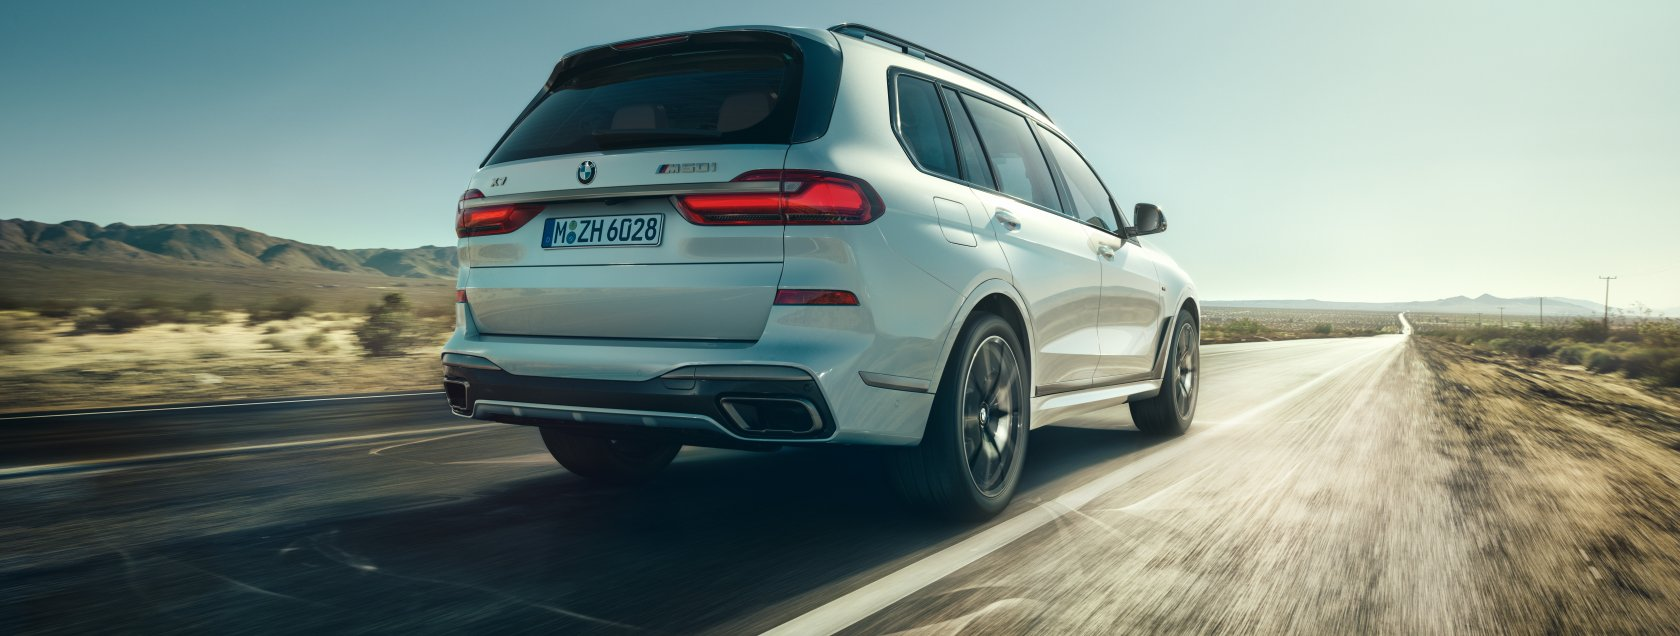 De nieuwe BMW X5 M50i en de nieuwe BMW X7 M50i